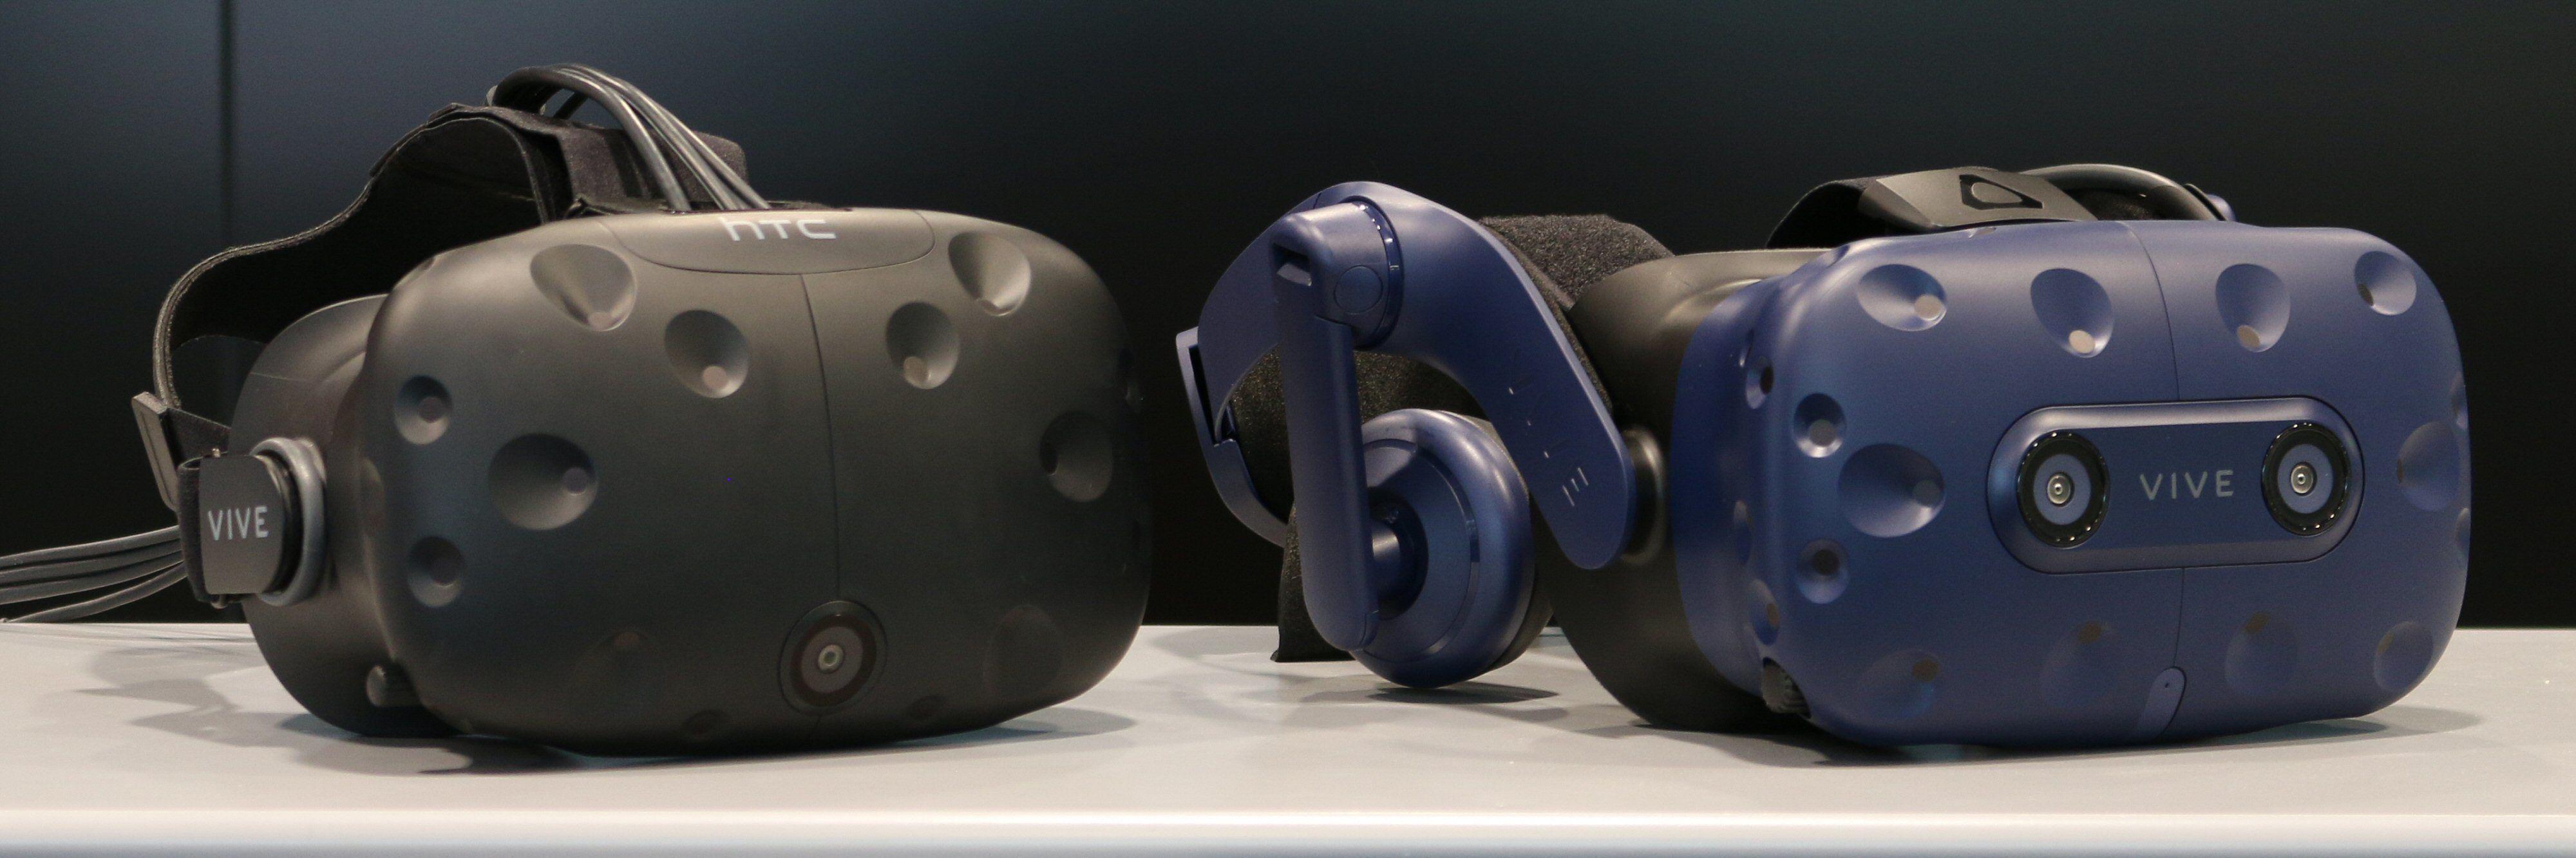 Gamle HTC Vive til venstre, nye Vive Pro til høyre.